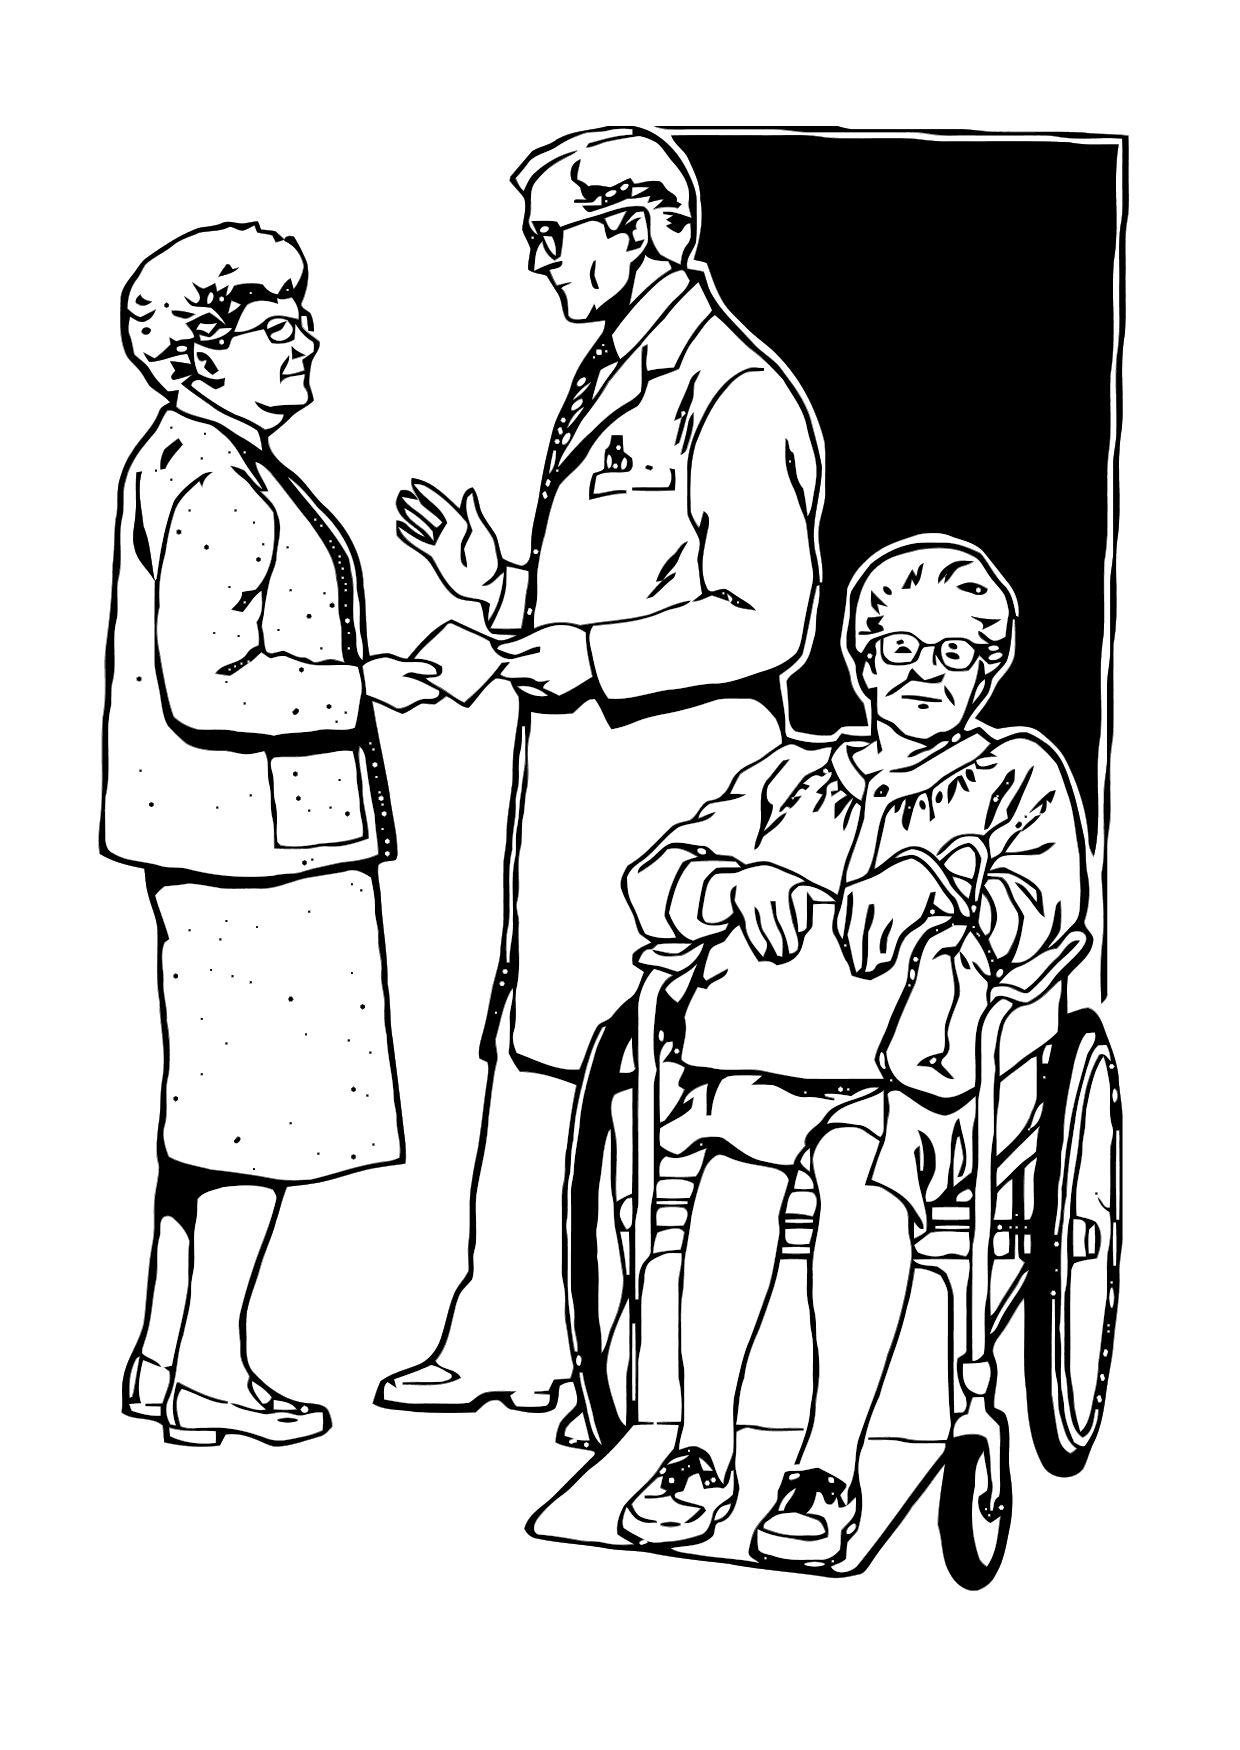 Dibujo para colorear Saliendo del hospital - Img 11875